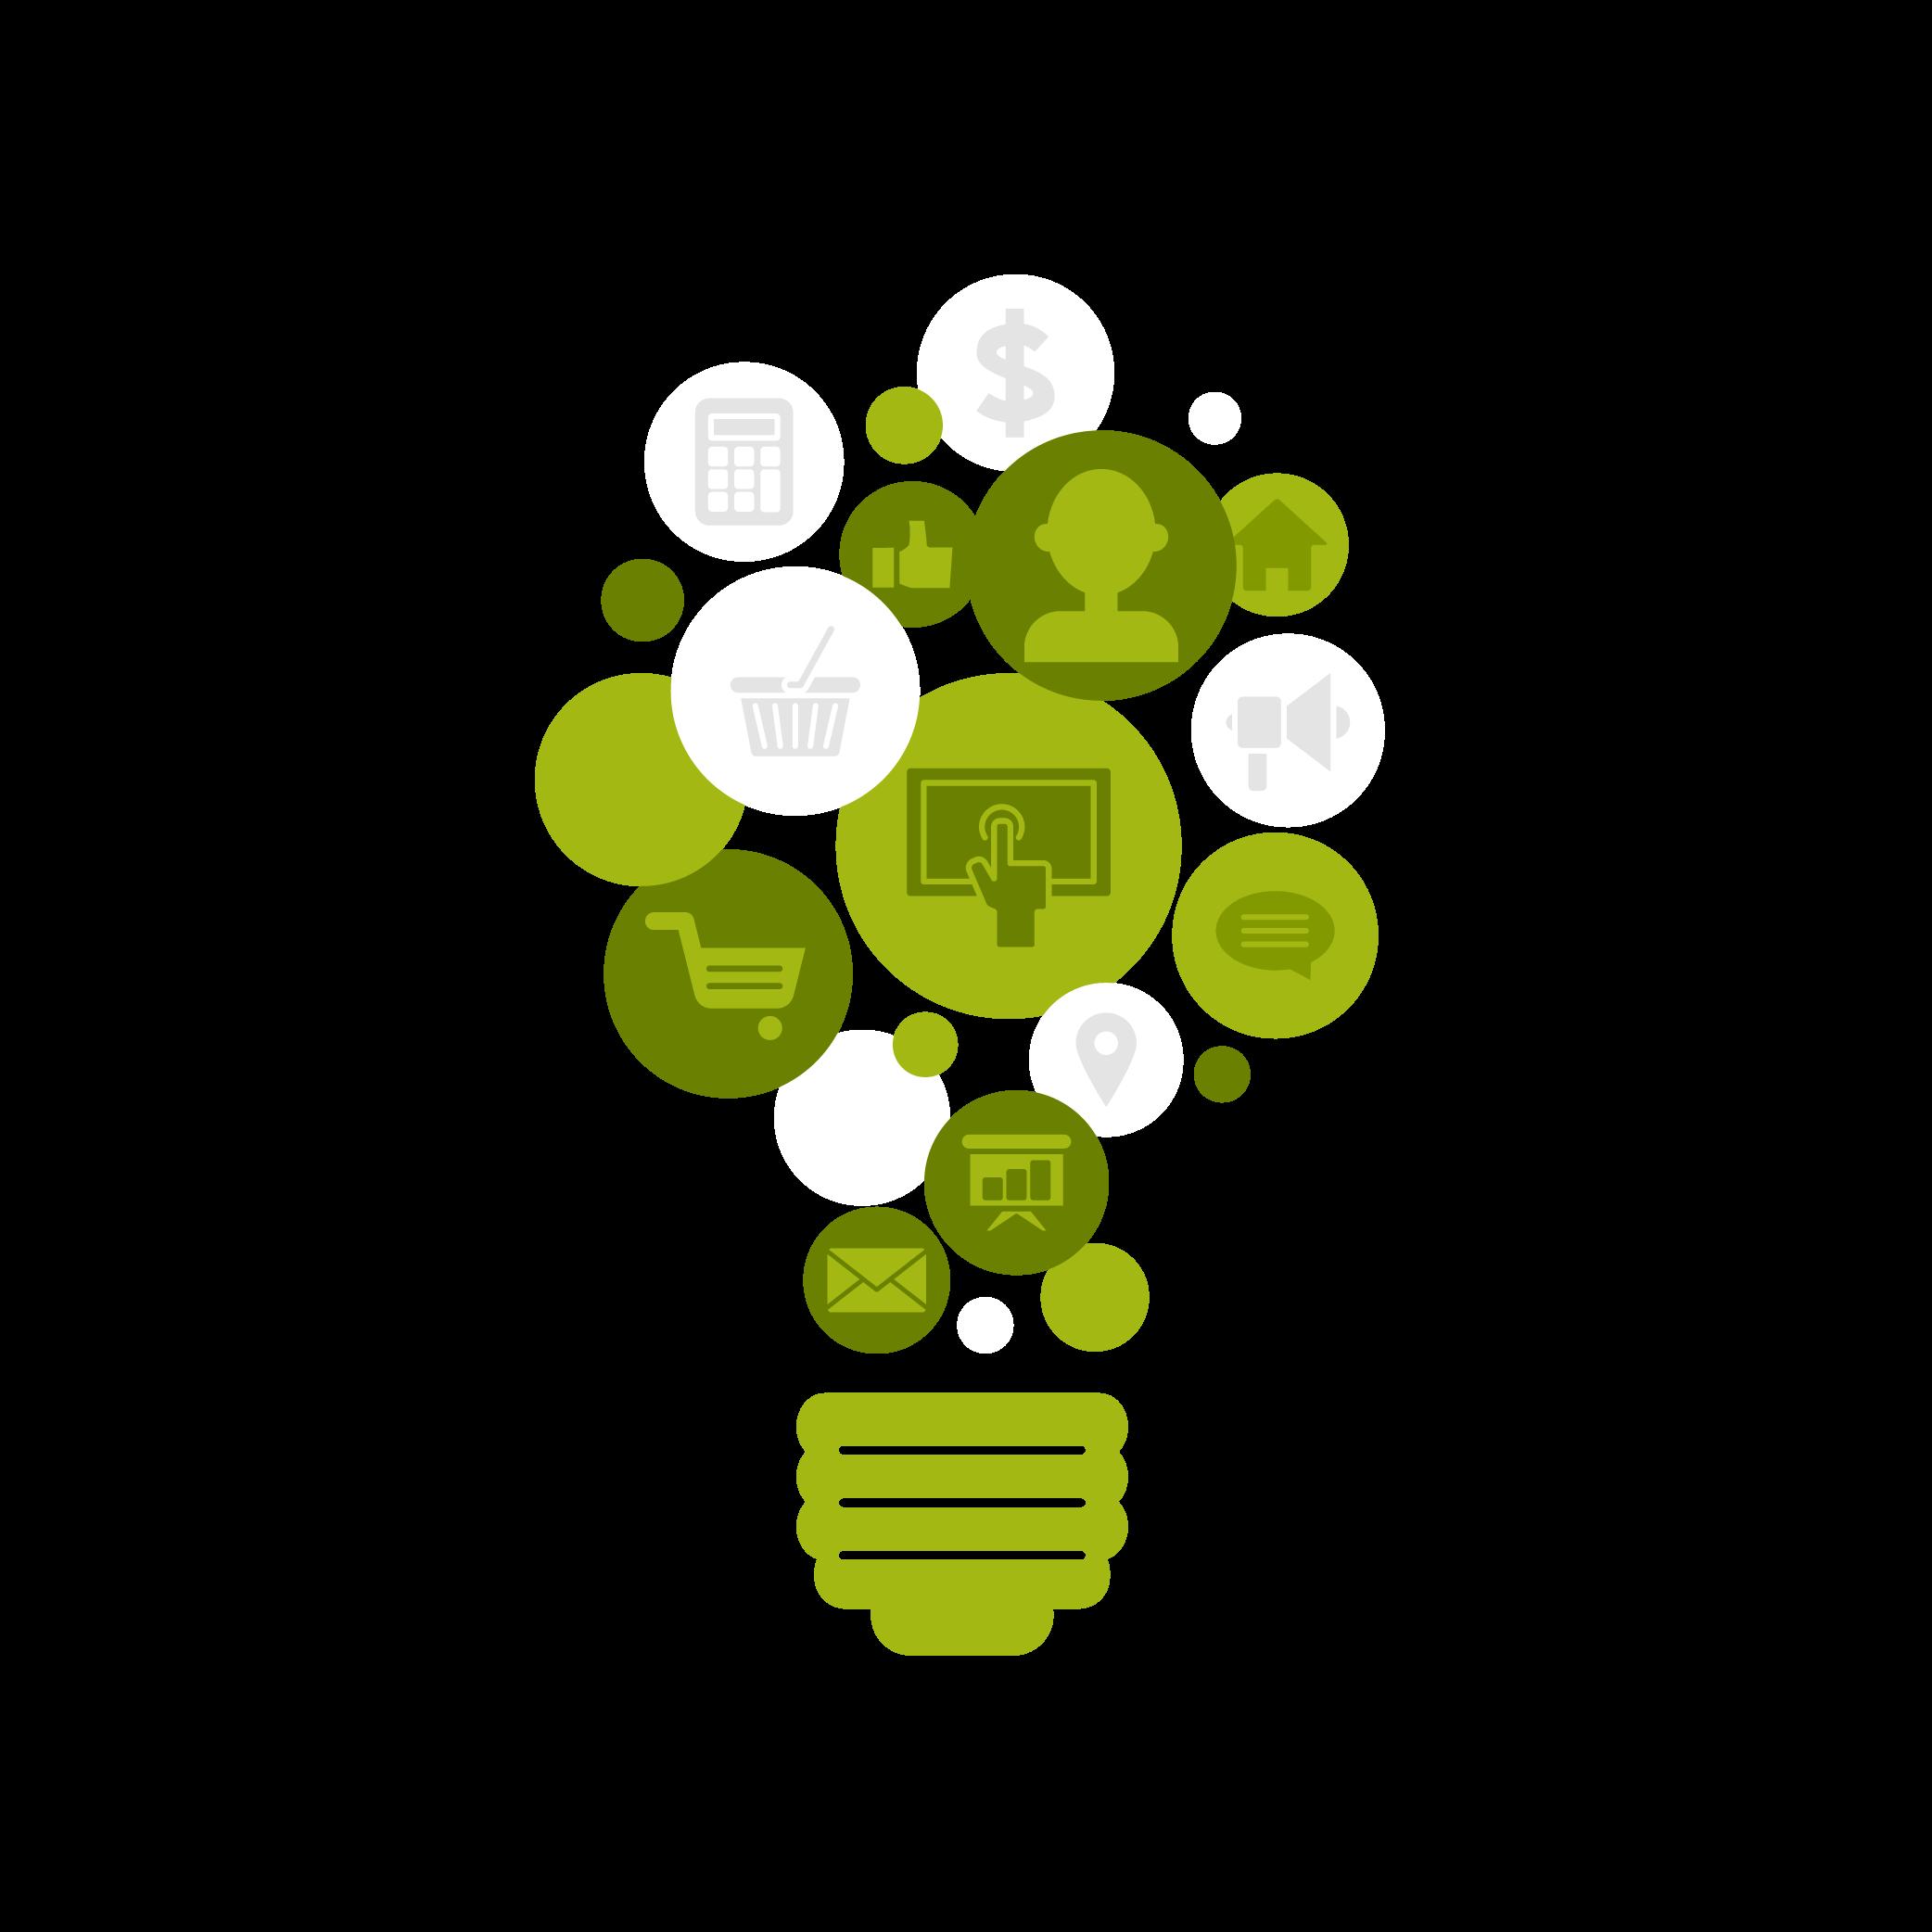 digital marketing benchmarks20 icon - Digital Marketing Benchmarks 2020